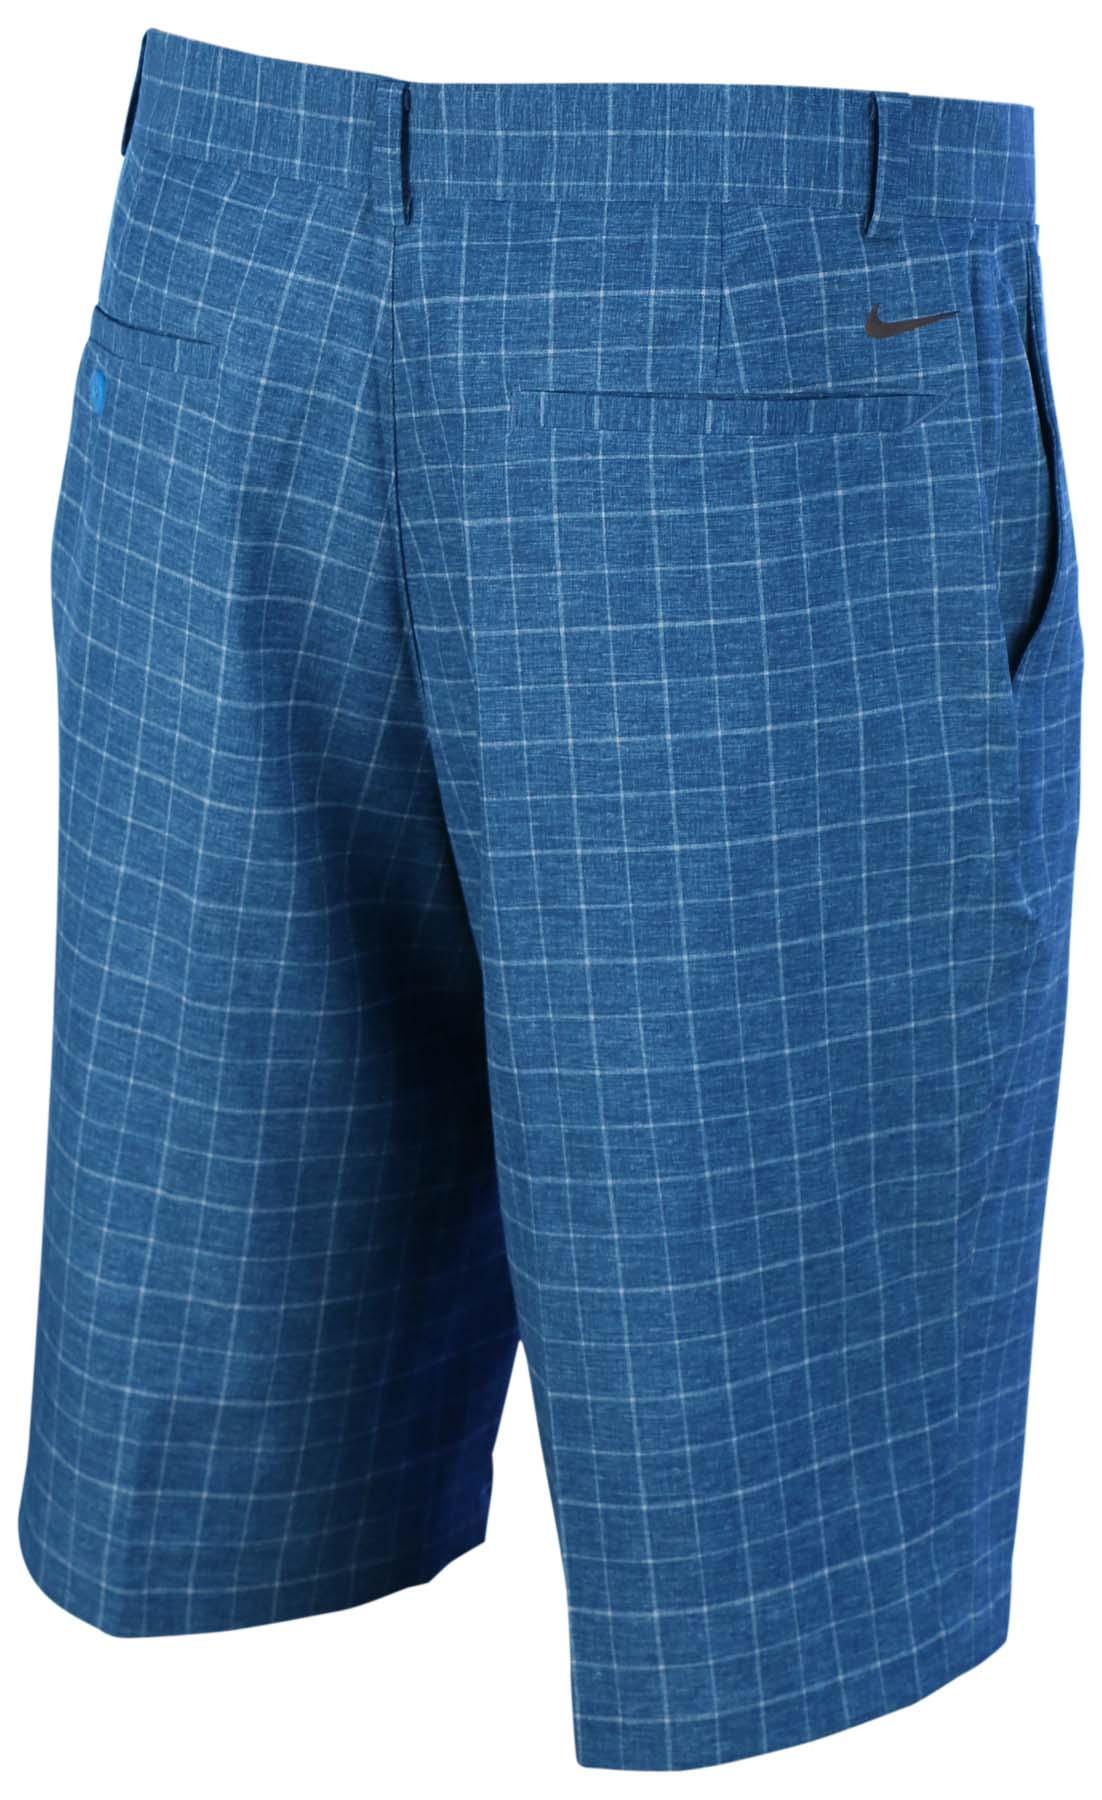 nike men 39 s dri fit plaid standard fit golf shorts ebay. Black Bedroom Furniture Sets. Home Design Ideas